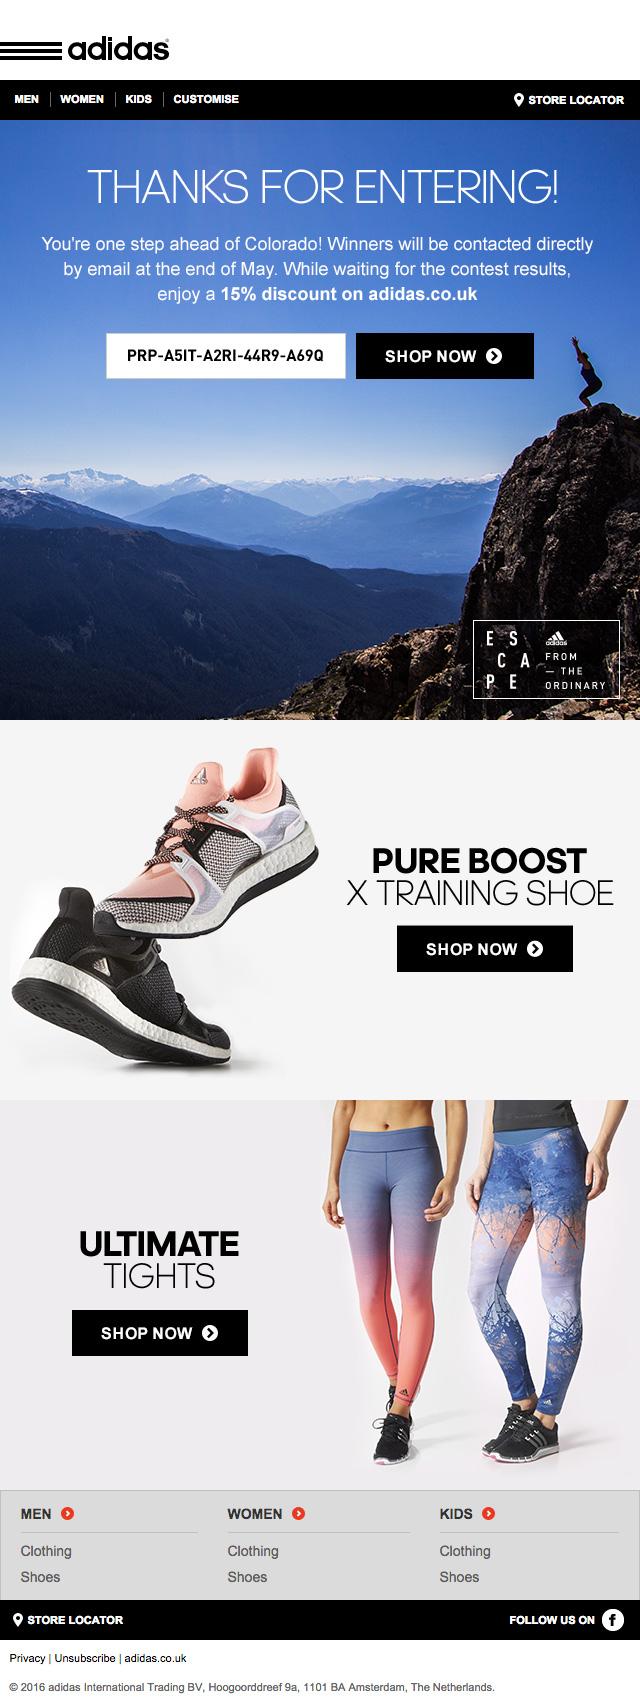 adidas mailing wanderlust